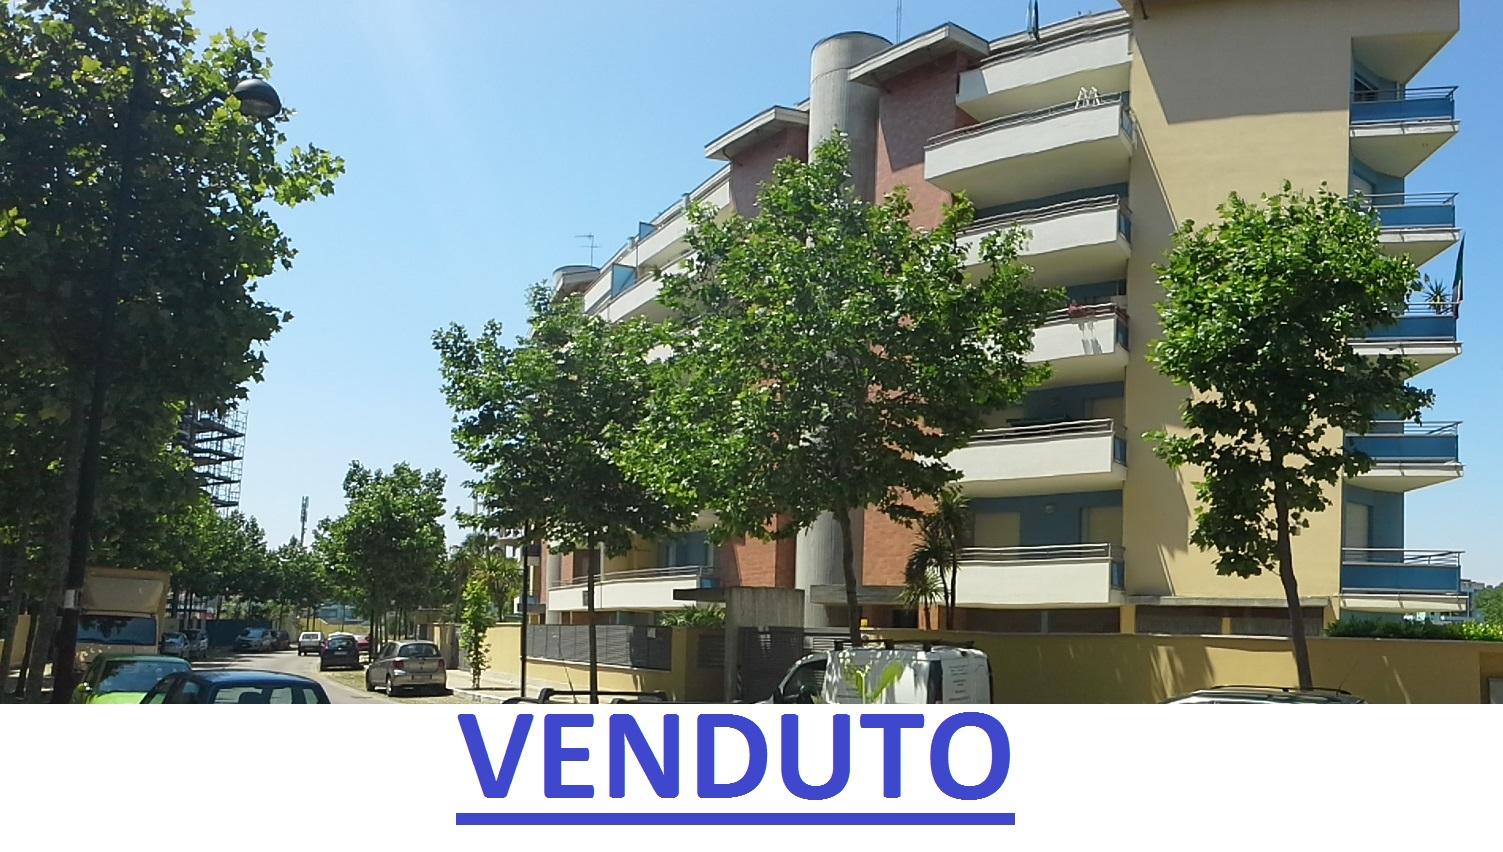 Montesilvano Via Finlandia appartamento arredato 3 locali